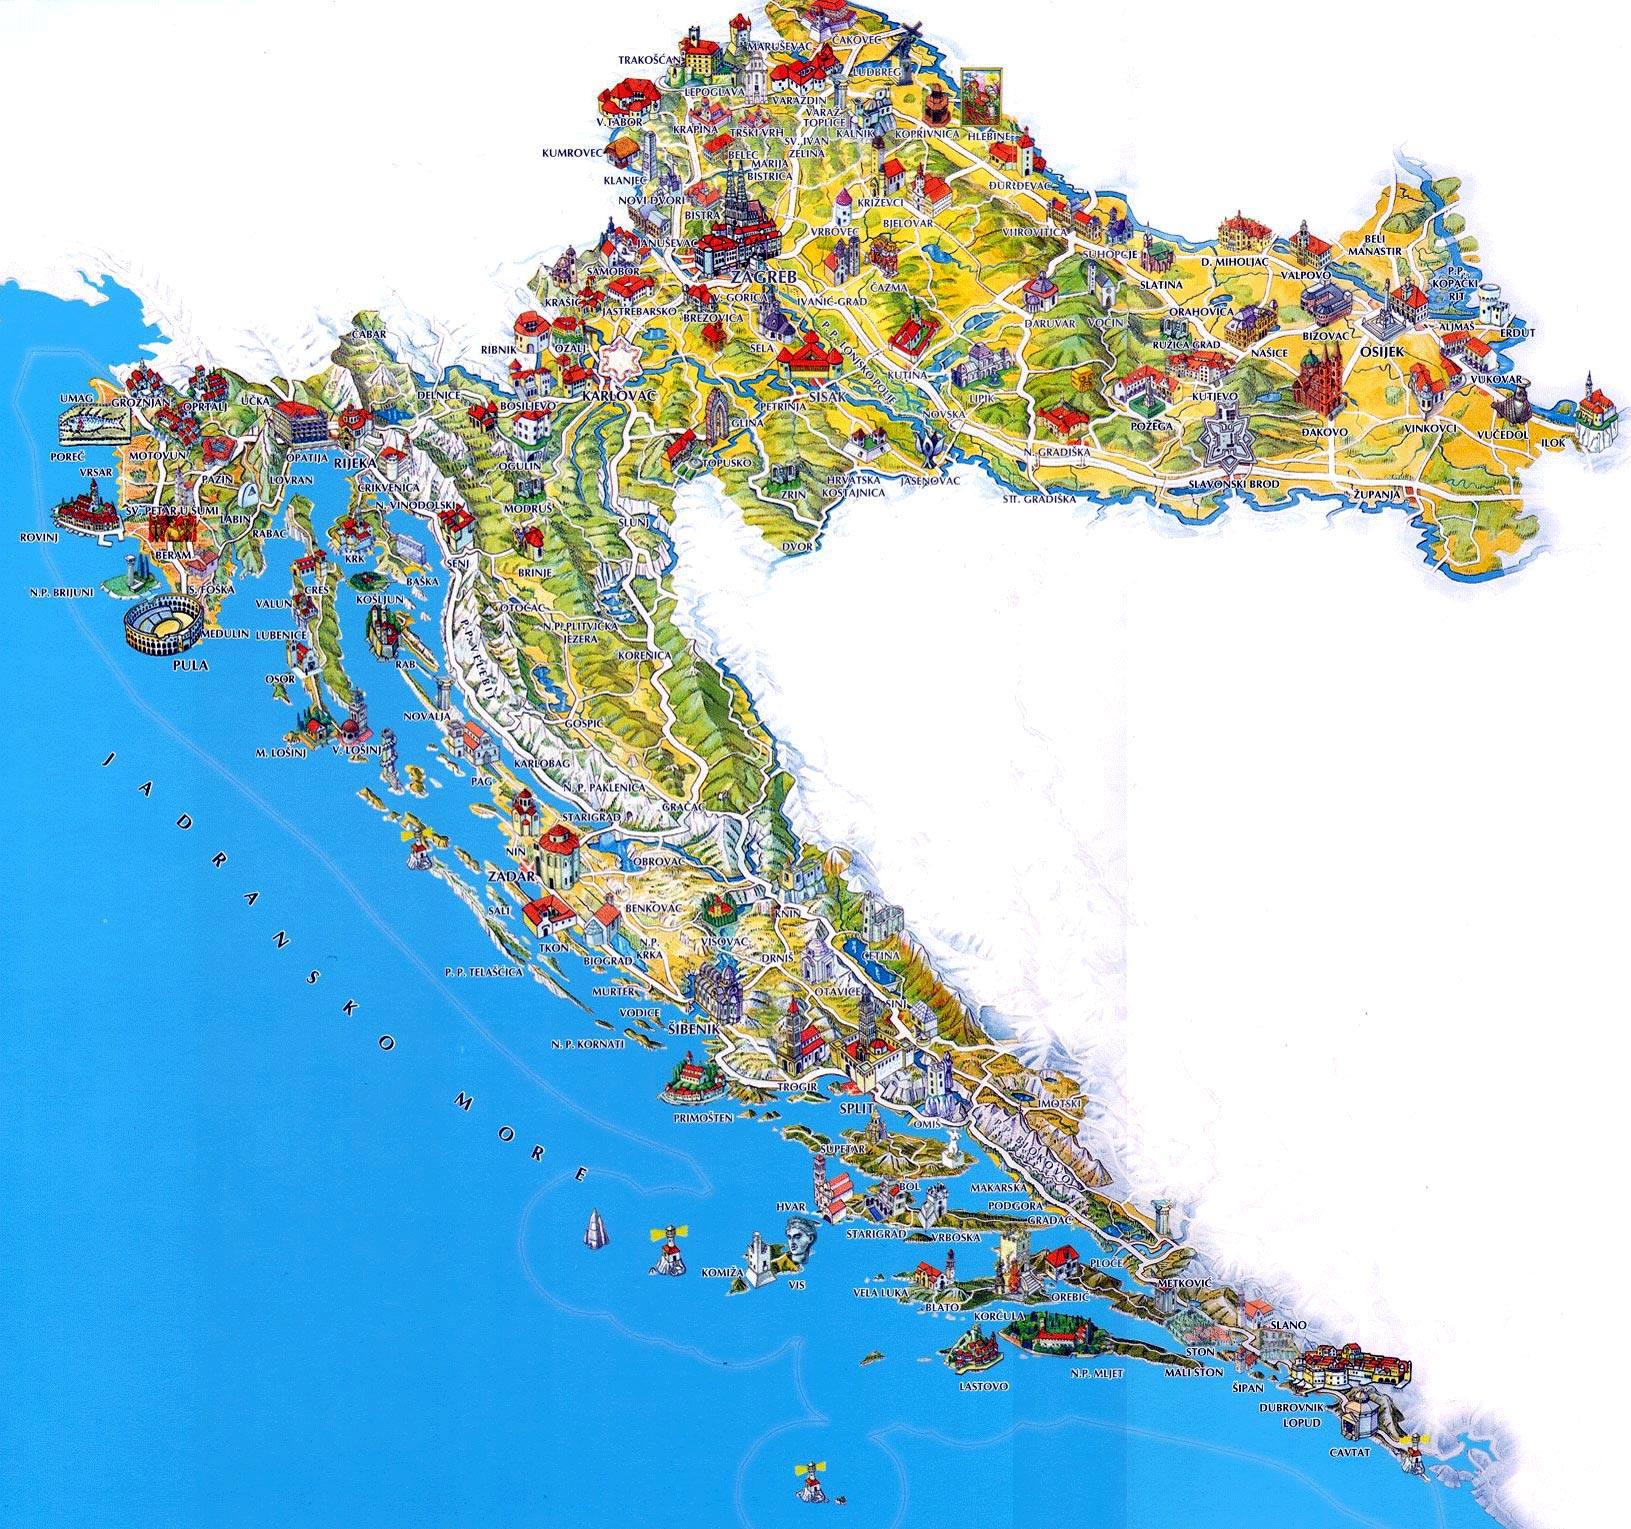 landkarte von kroatien Karten von Kroatien | Karten von Kroatien zum Herunterladen und  landkarte von kroatien